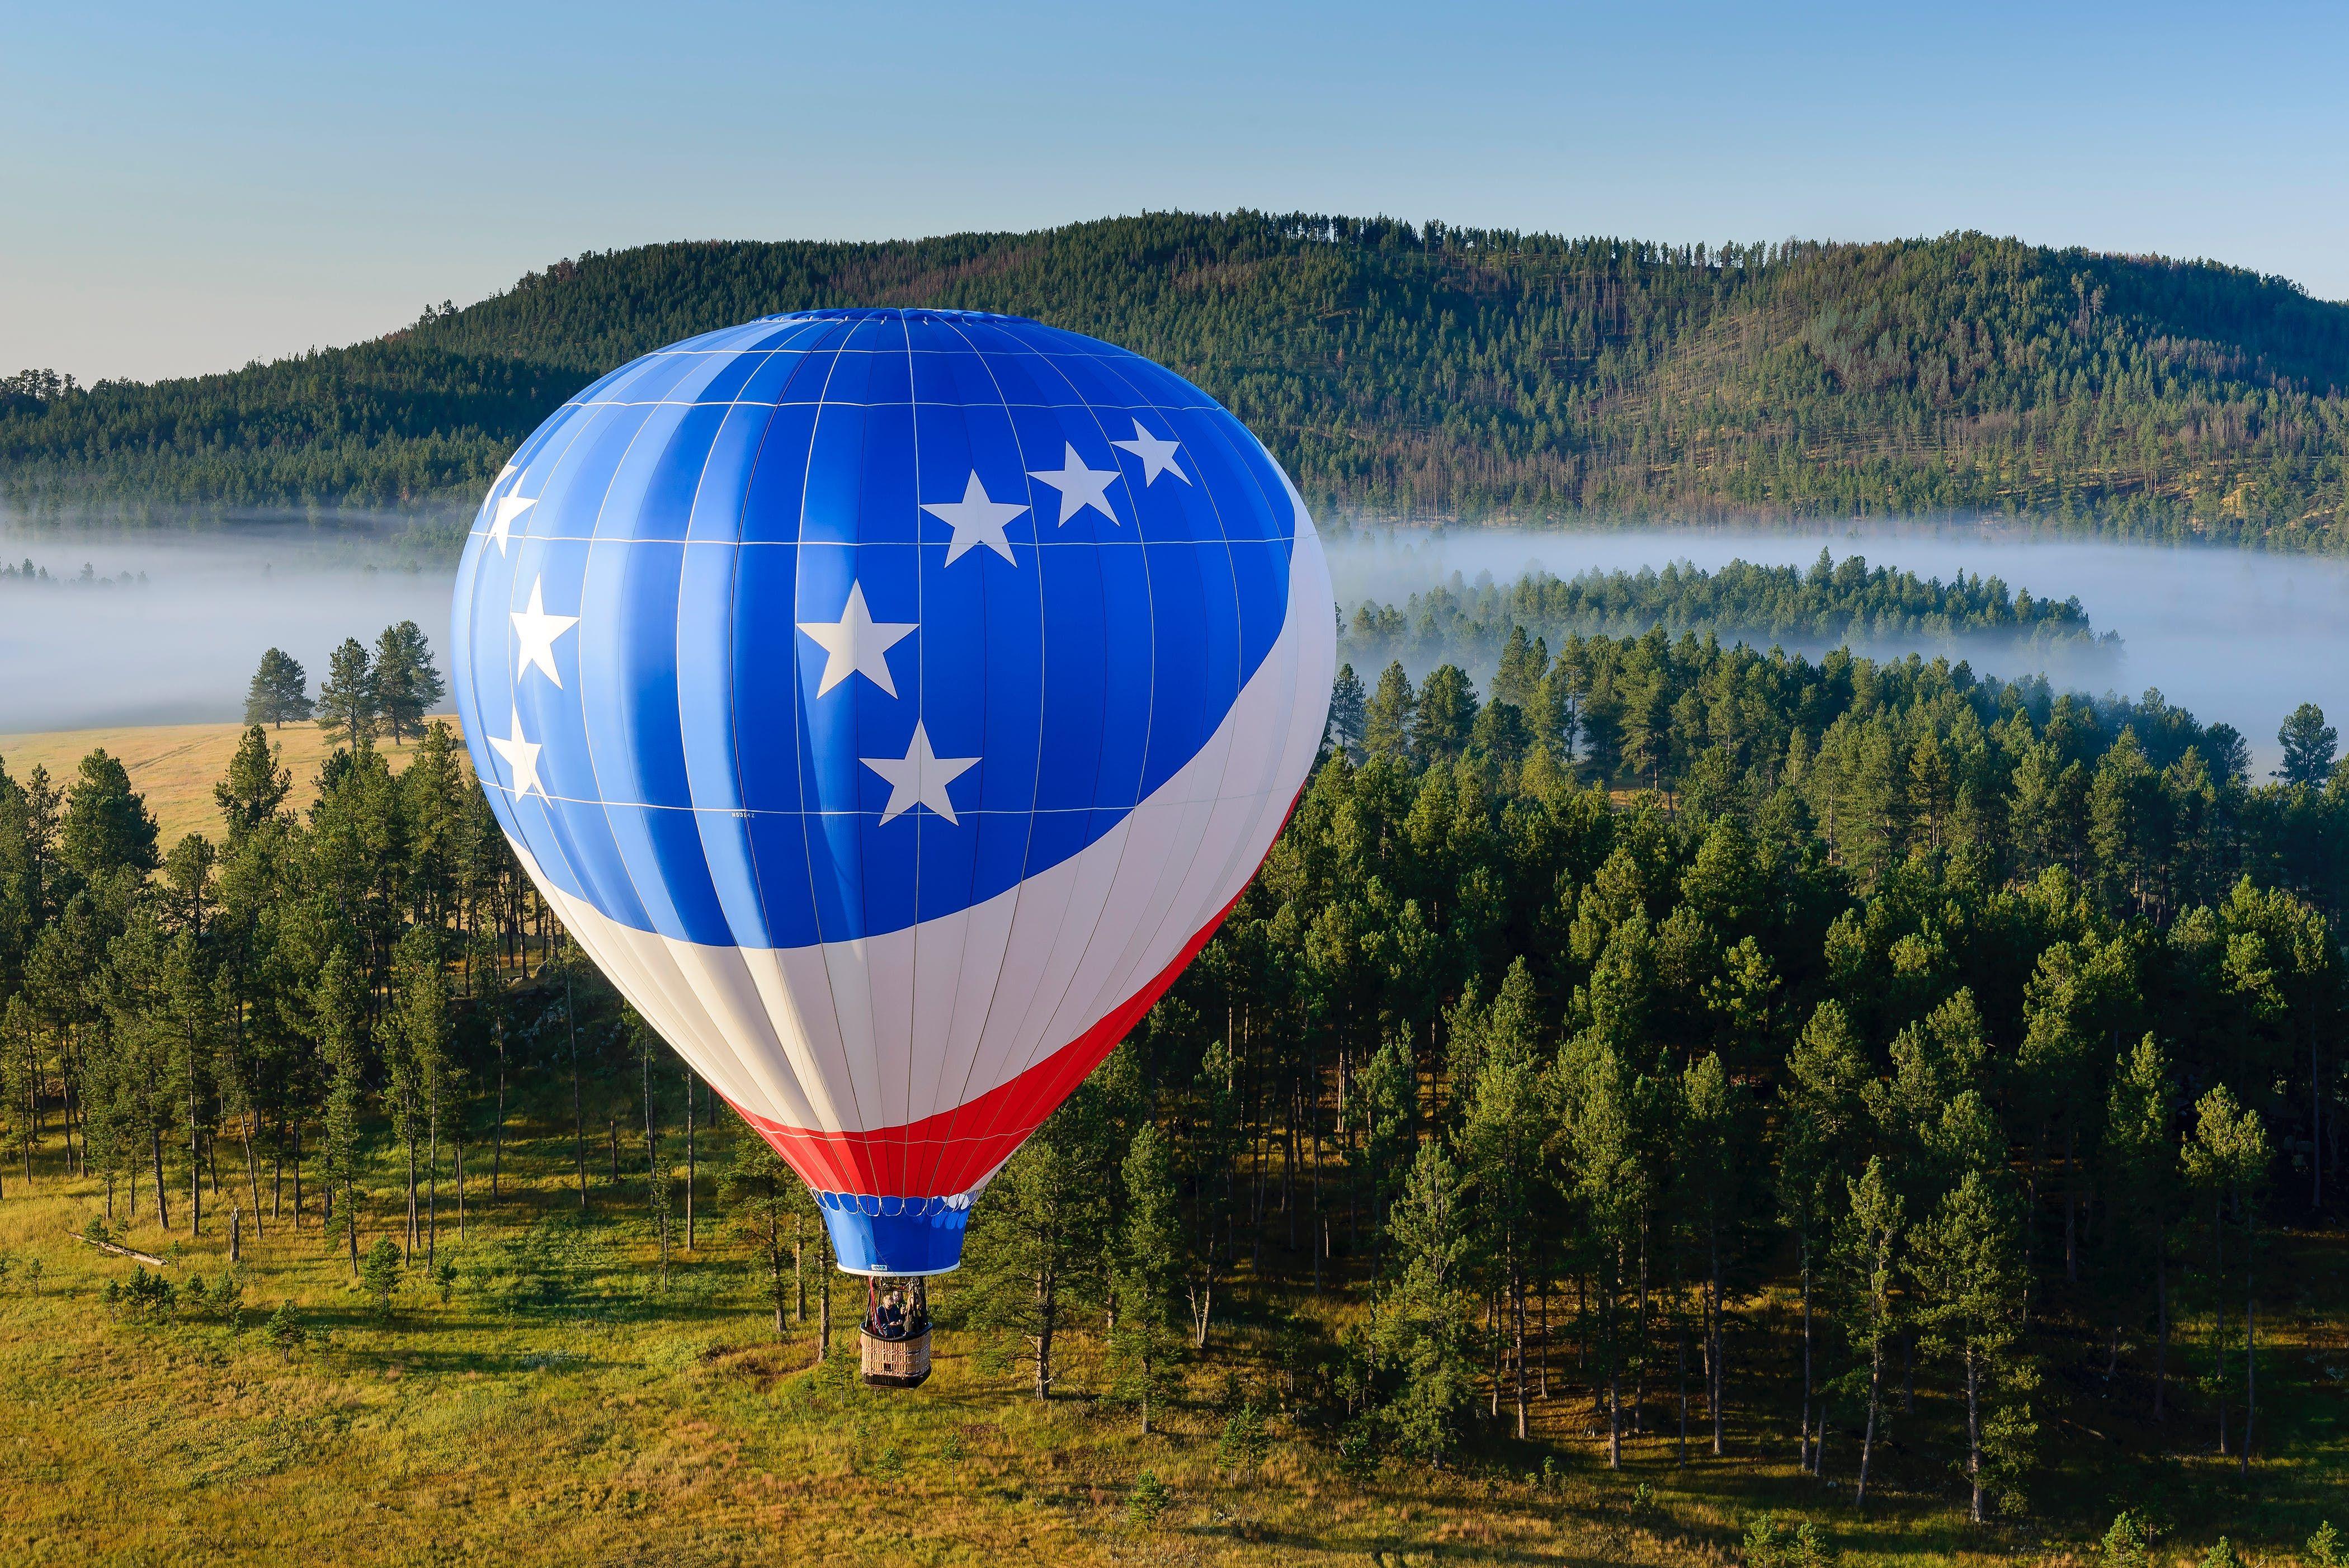 20 Places Where You Can Go on a Romantic HotAir Balloon